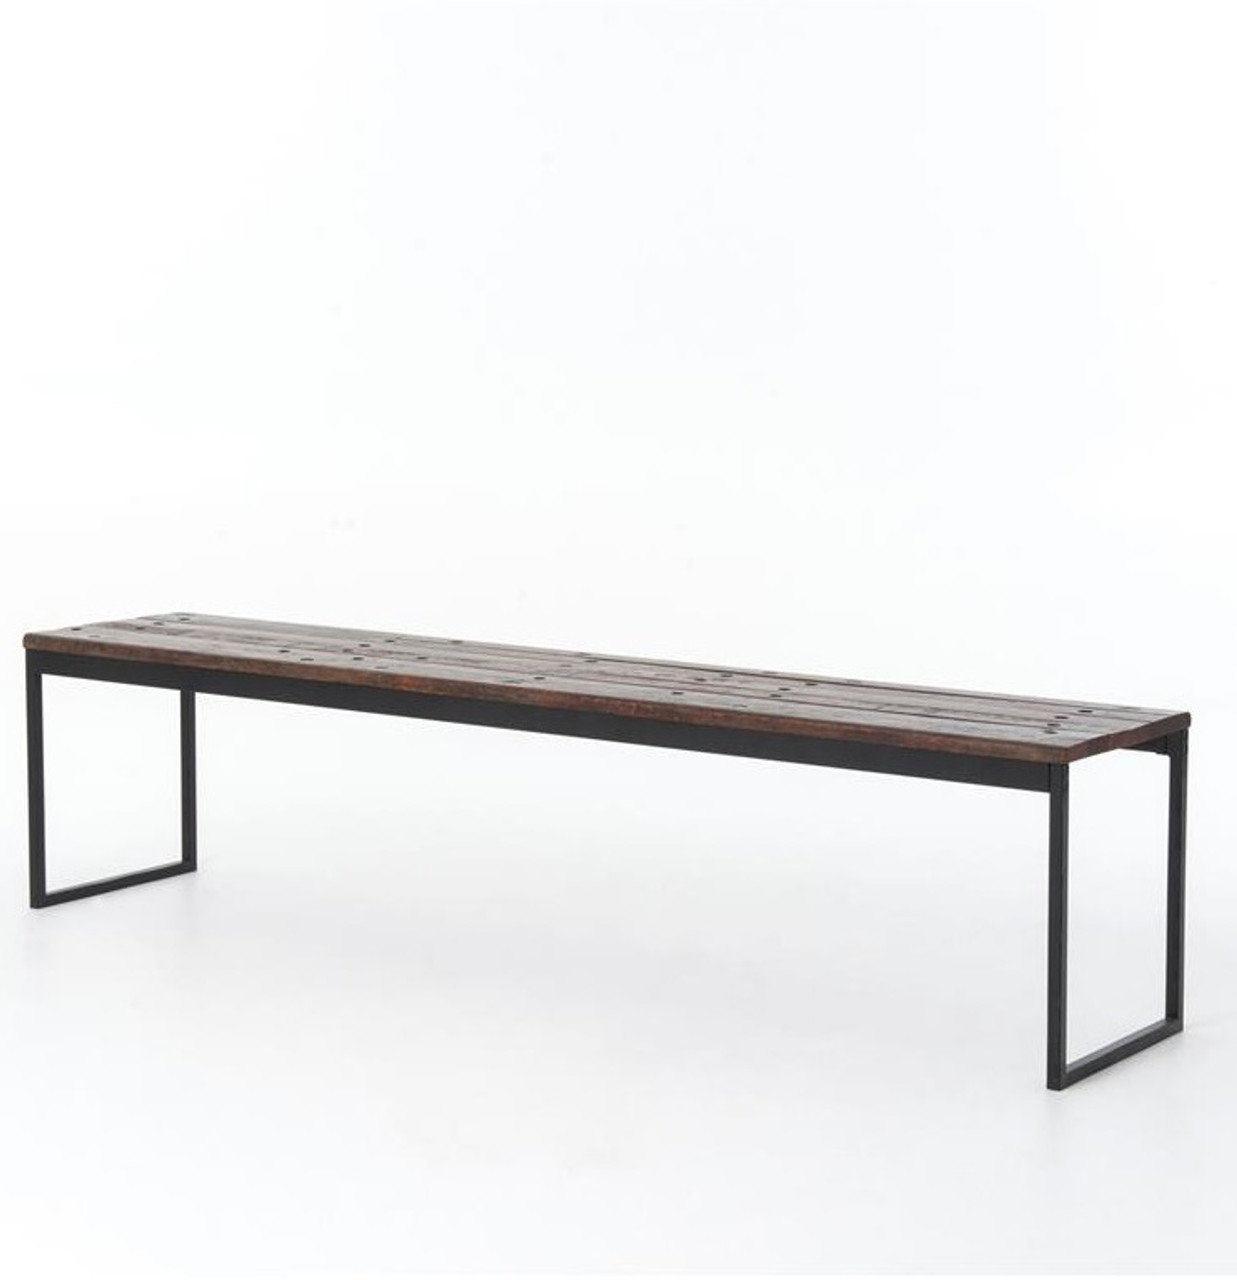 Vincent Industrial Bench